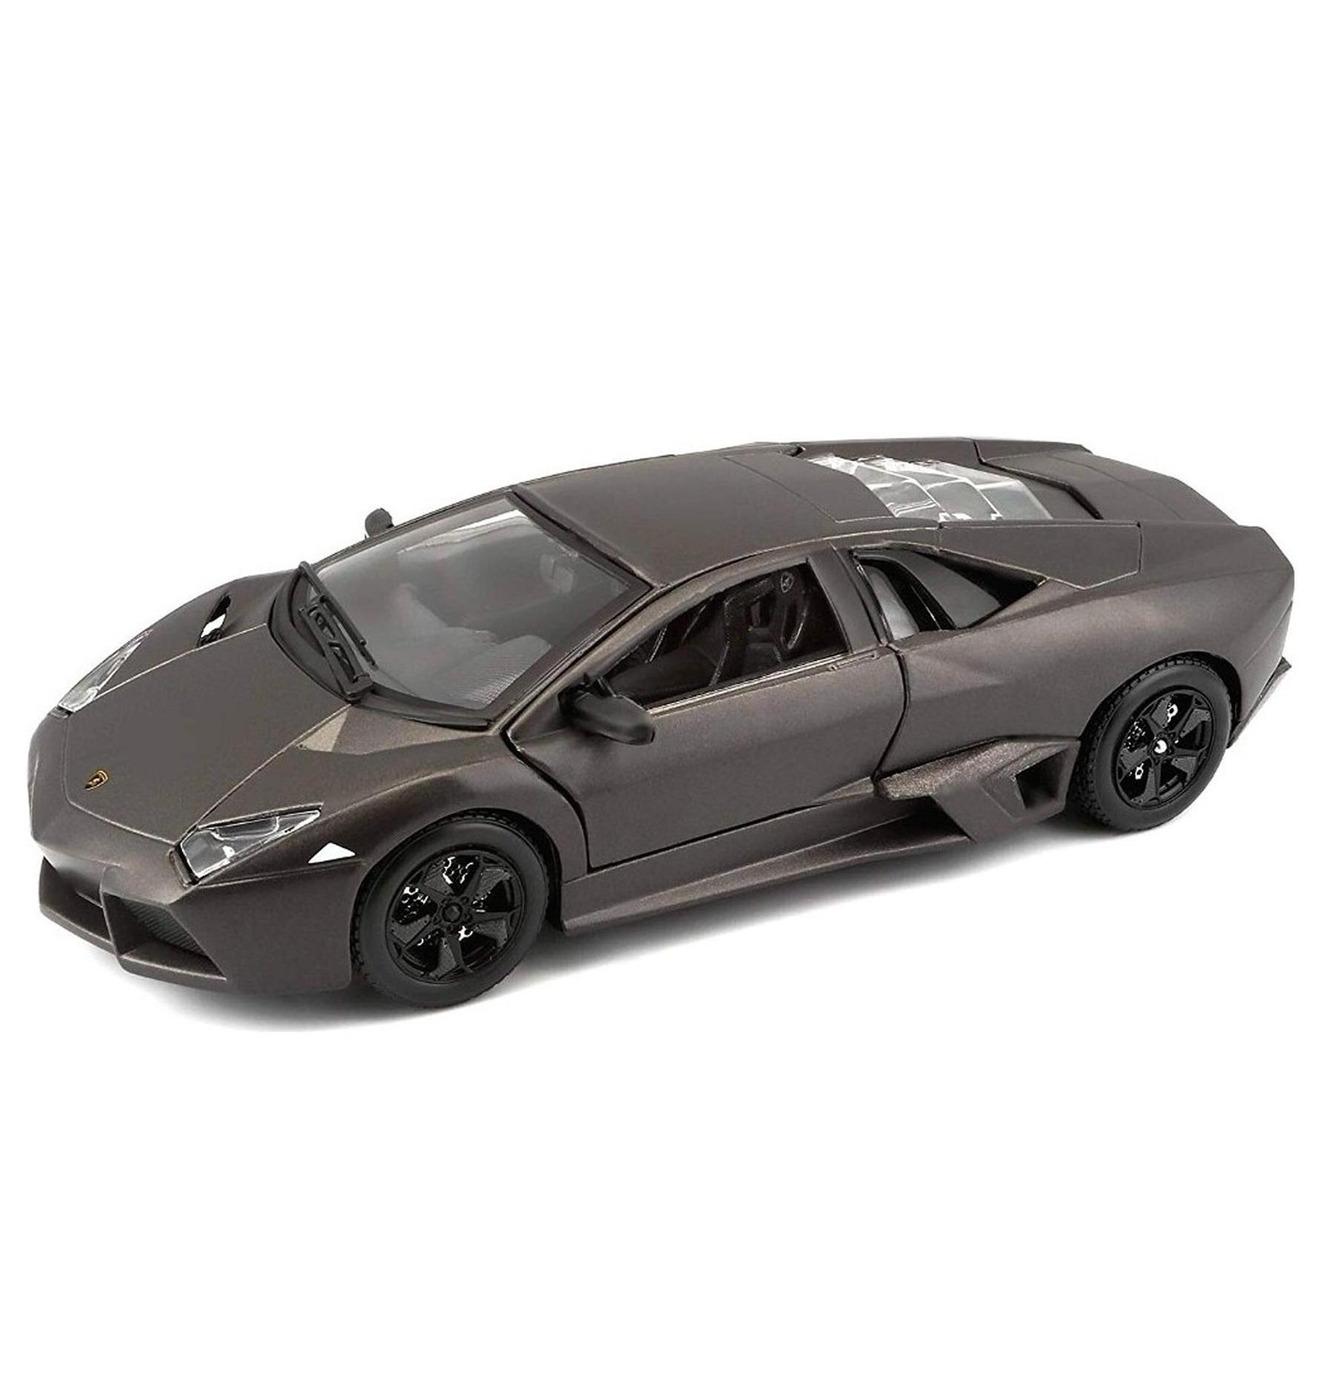 Bburago Машинка металлическая 1:24 Lamborghini Reventon, серый металлик, 18-21041